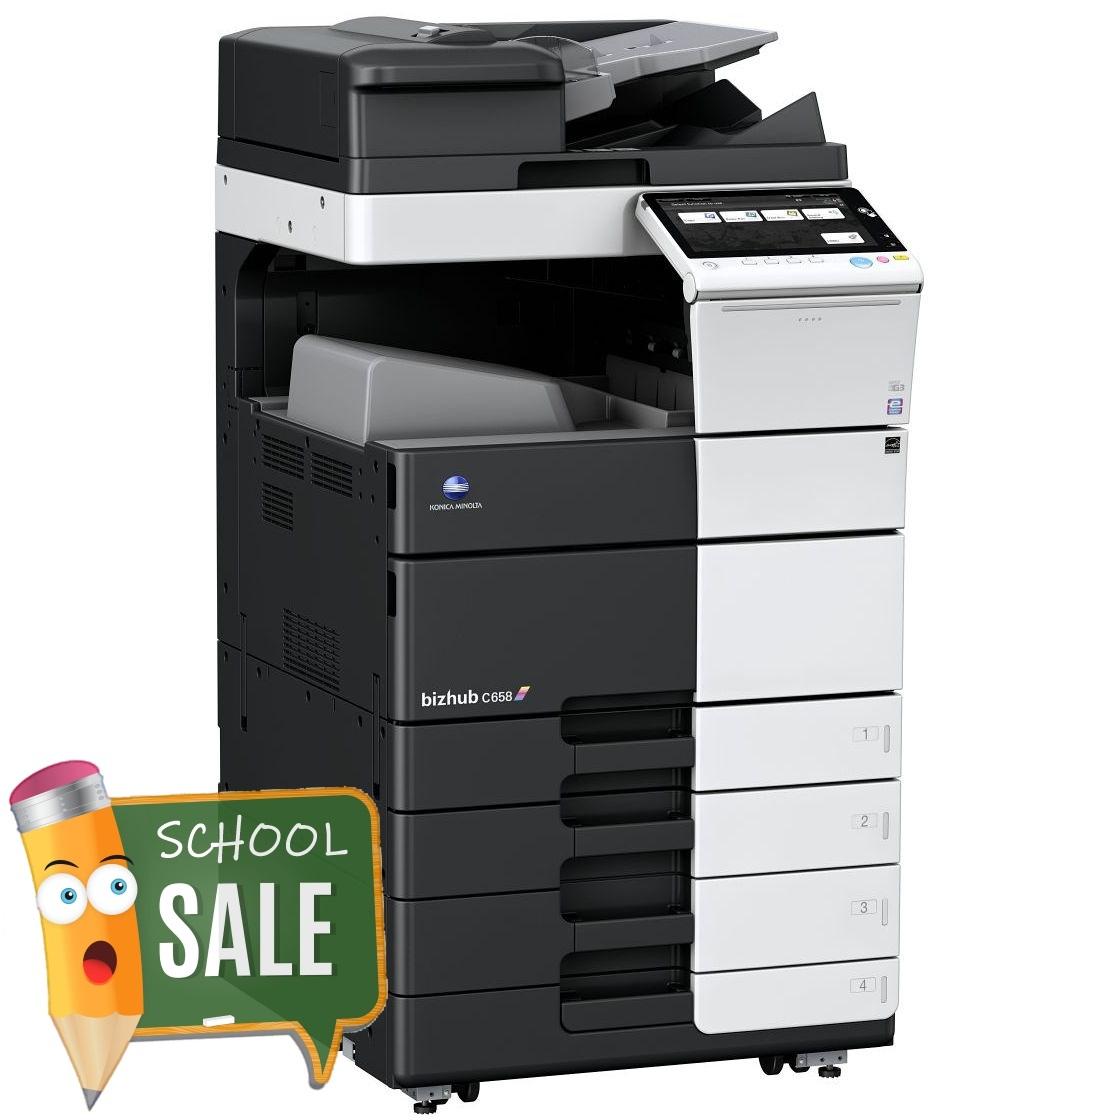 Konica Minolta Bizhub C658 OT 506 PC 215 Colour Copier Printer Rental Price Offers